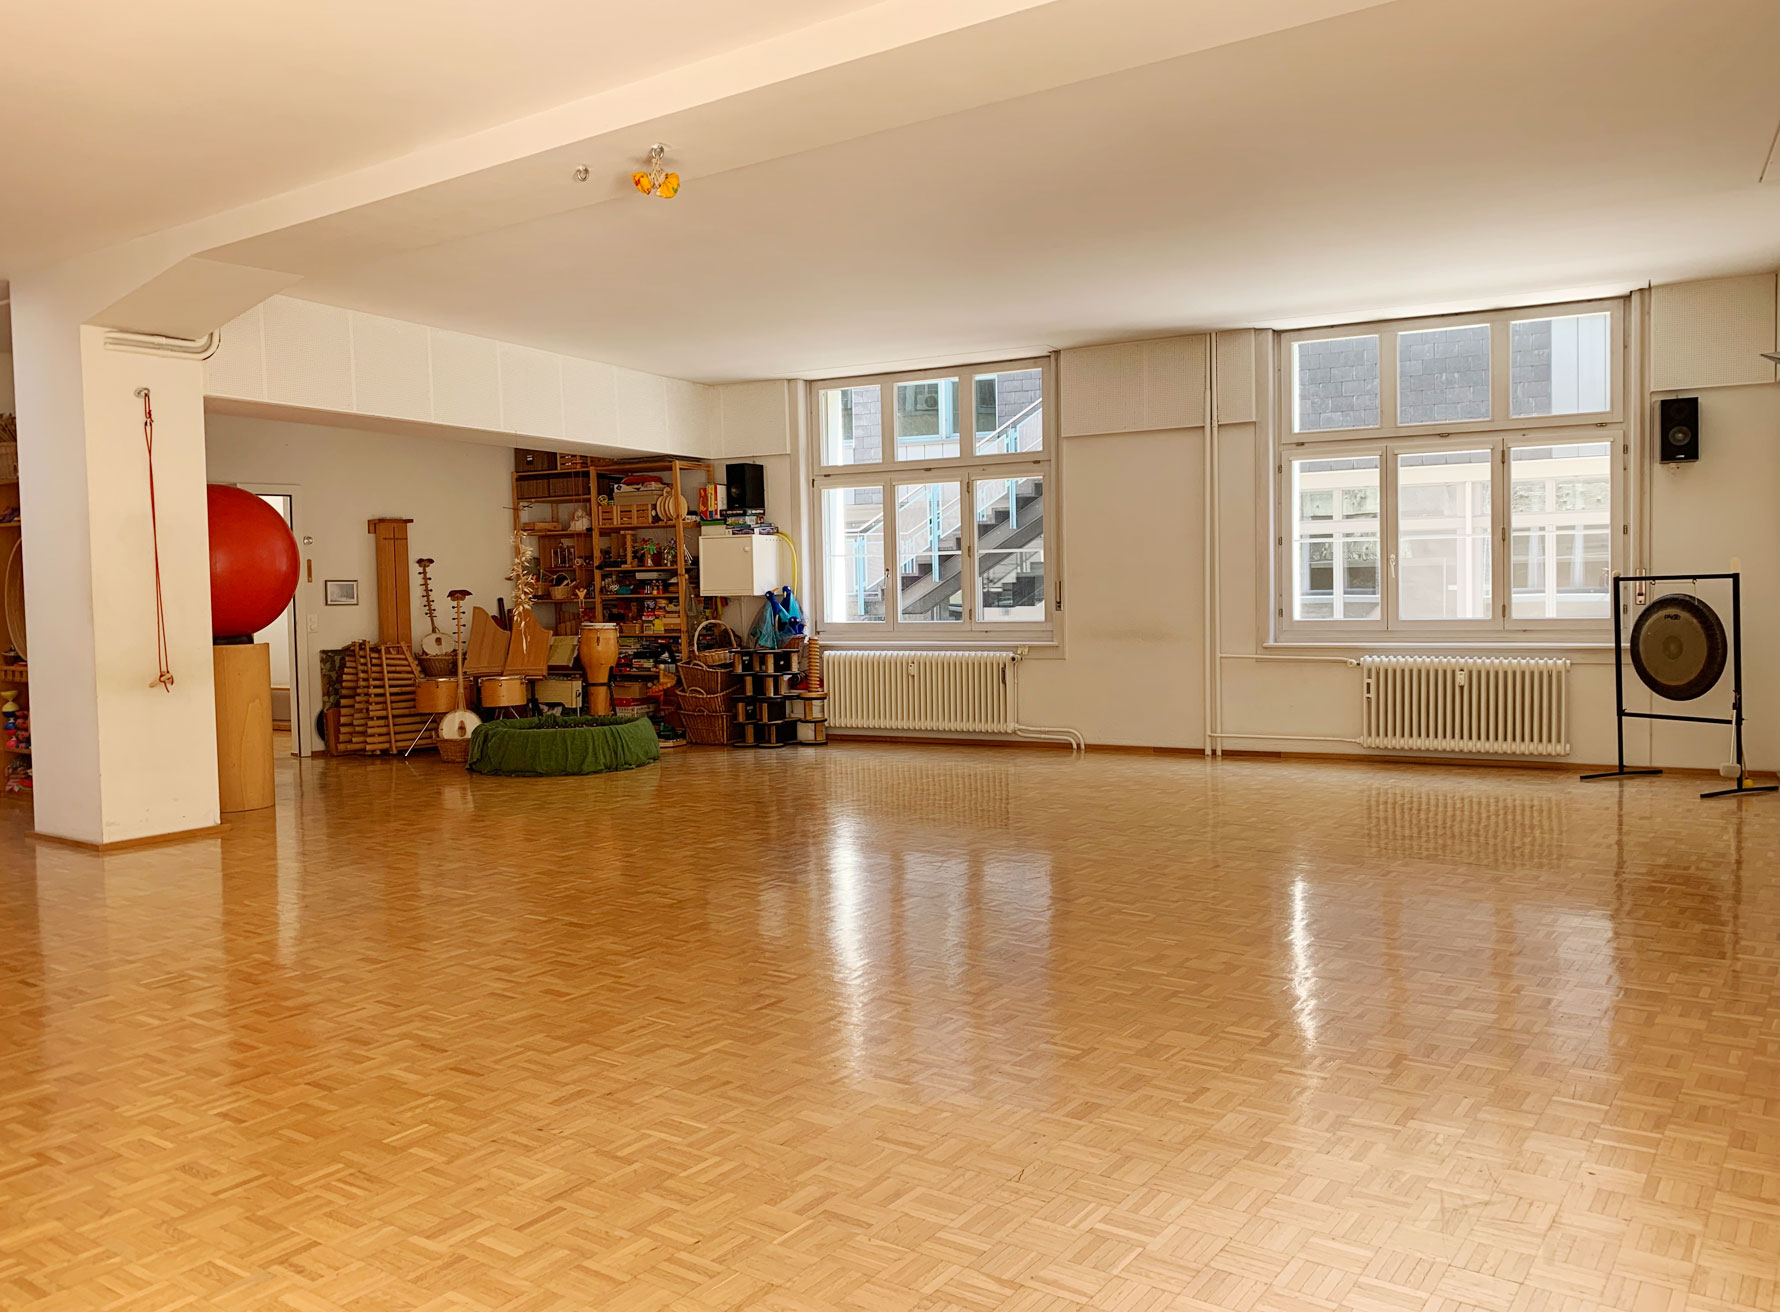 Raum Bild 3